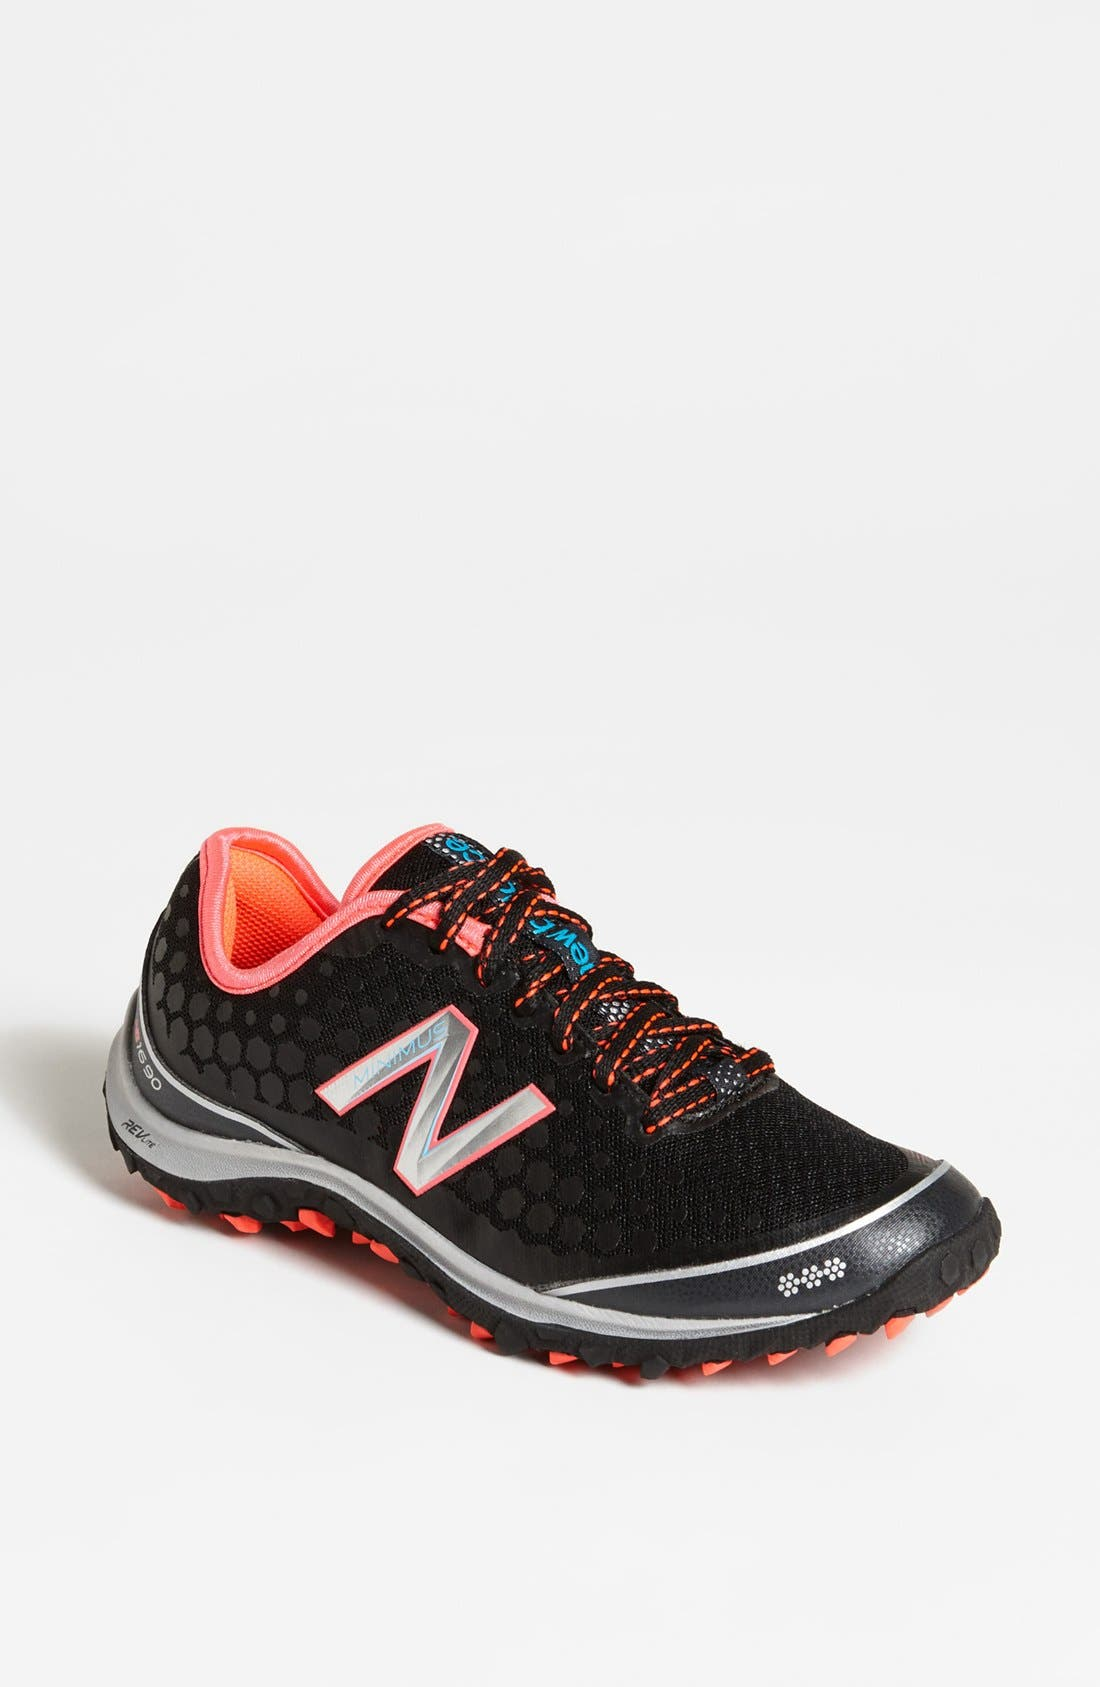 Alternate Image 1 Selected - New Balance '1690' Running Shoe (Women)